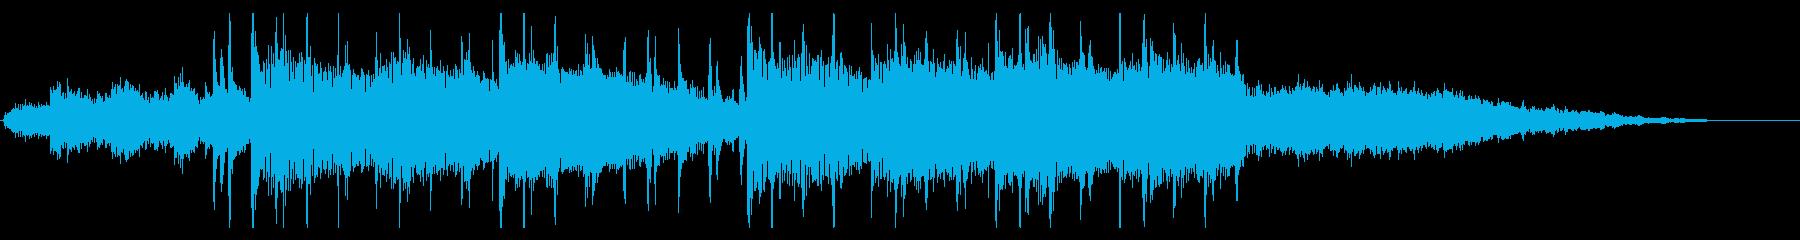 texture13の再生済みの波形